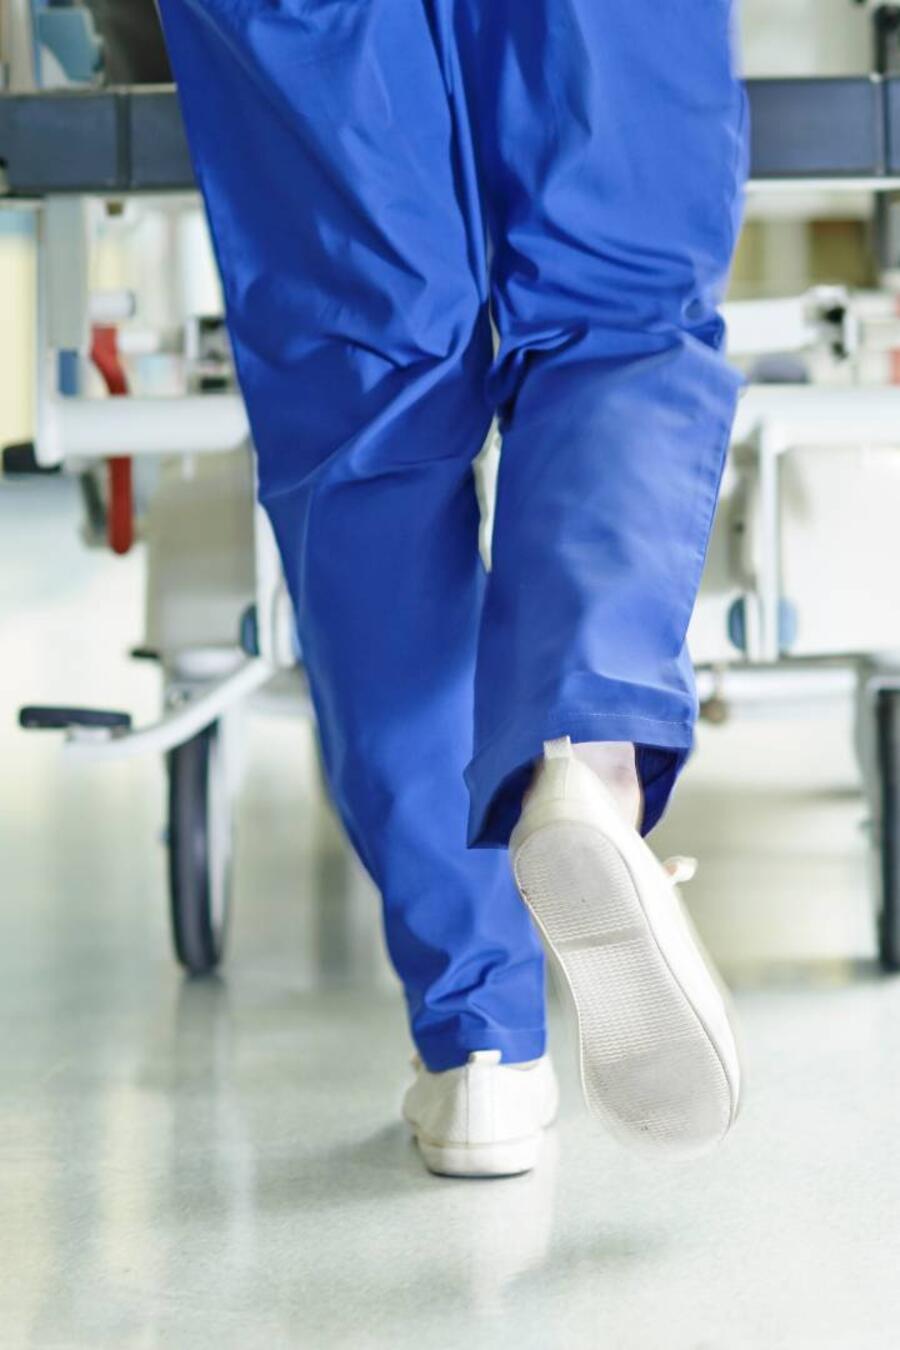 Enfermera en pasillo de hospital